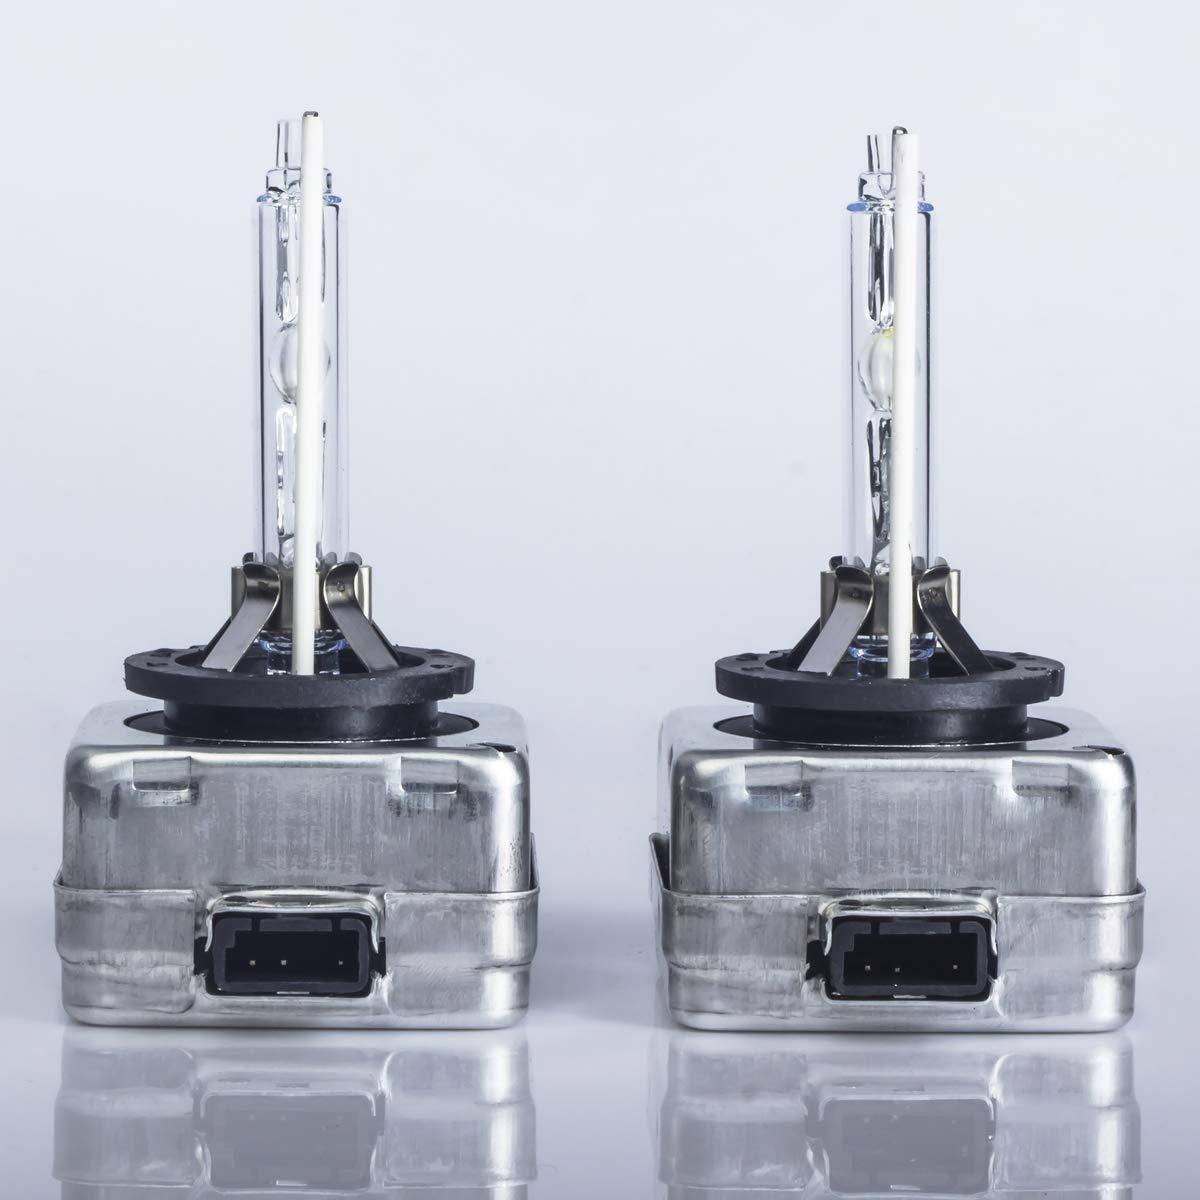 2pcs//PAIR OEM Direct Replacement Headlight Bulbs 35W HID Xenon Headlight Light D1S D2S D2R D3S D4S D4R 6000K D4S Generic D1S//D2S//D3S//D4S